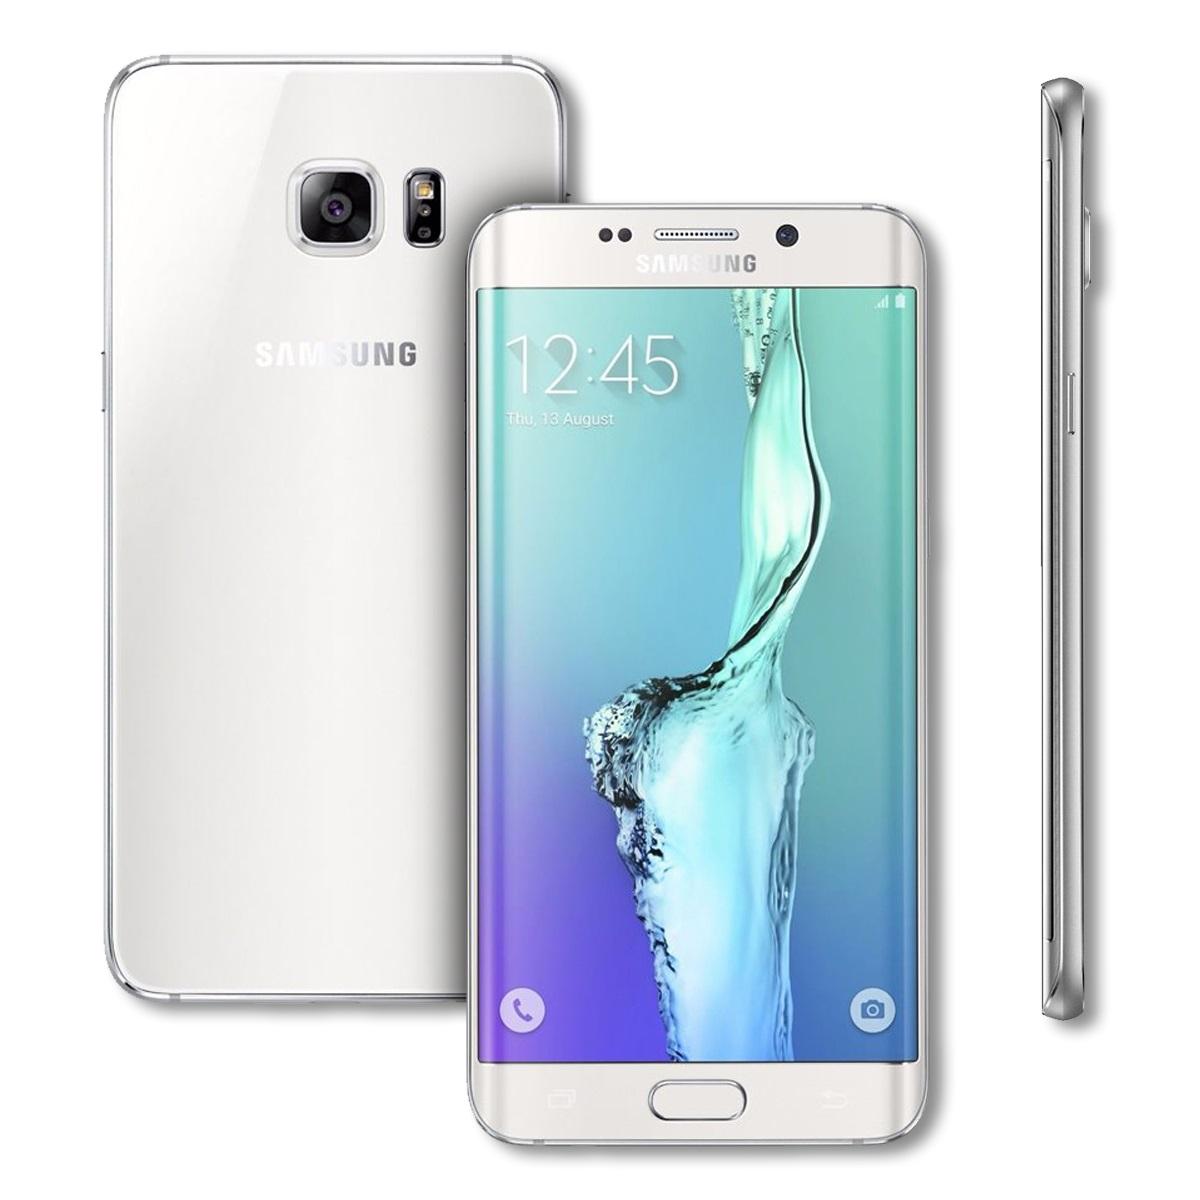 samsung galaxy s6 edge plus sm g928v smartphone verizon 4g. Black Bedroom Furniture Sets. Home Design Ideas